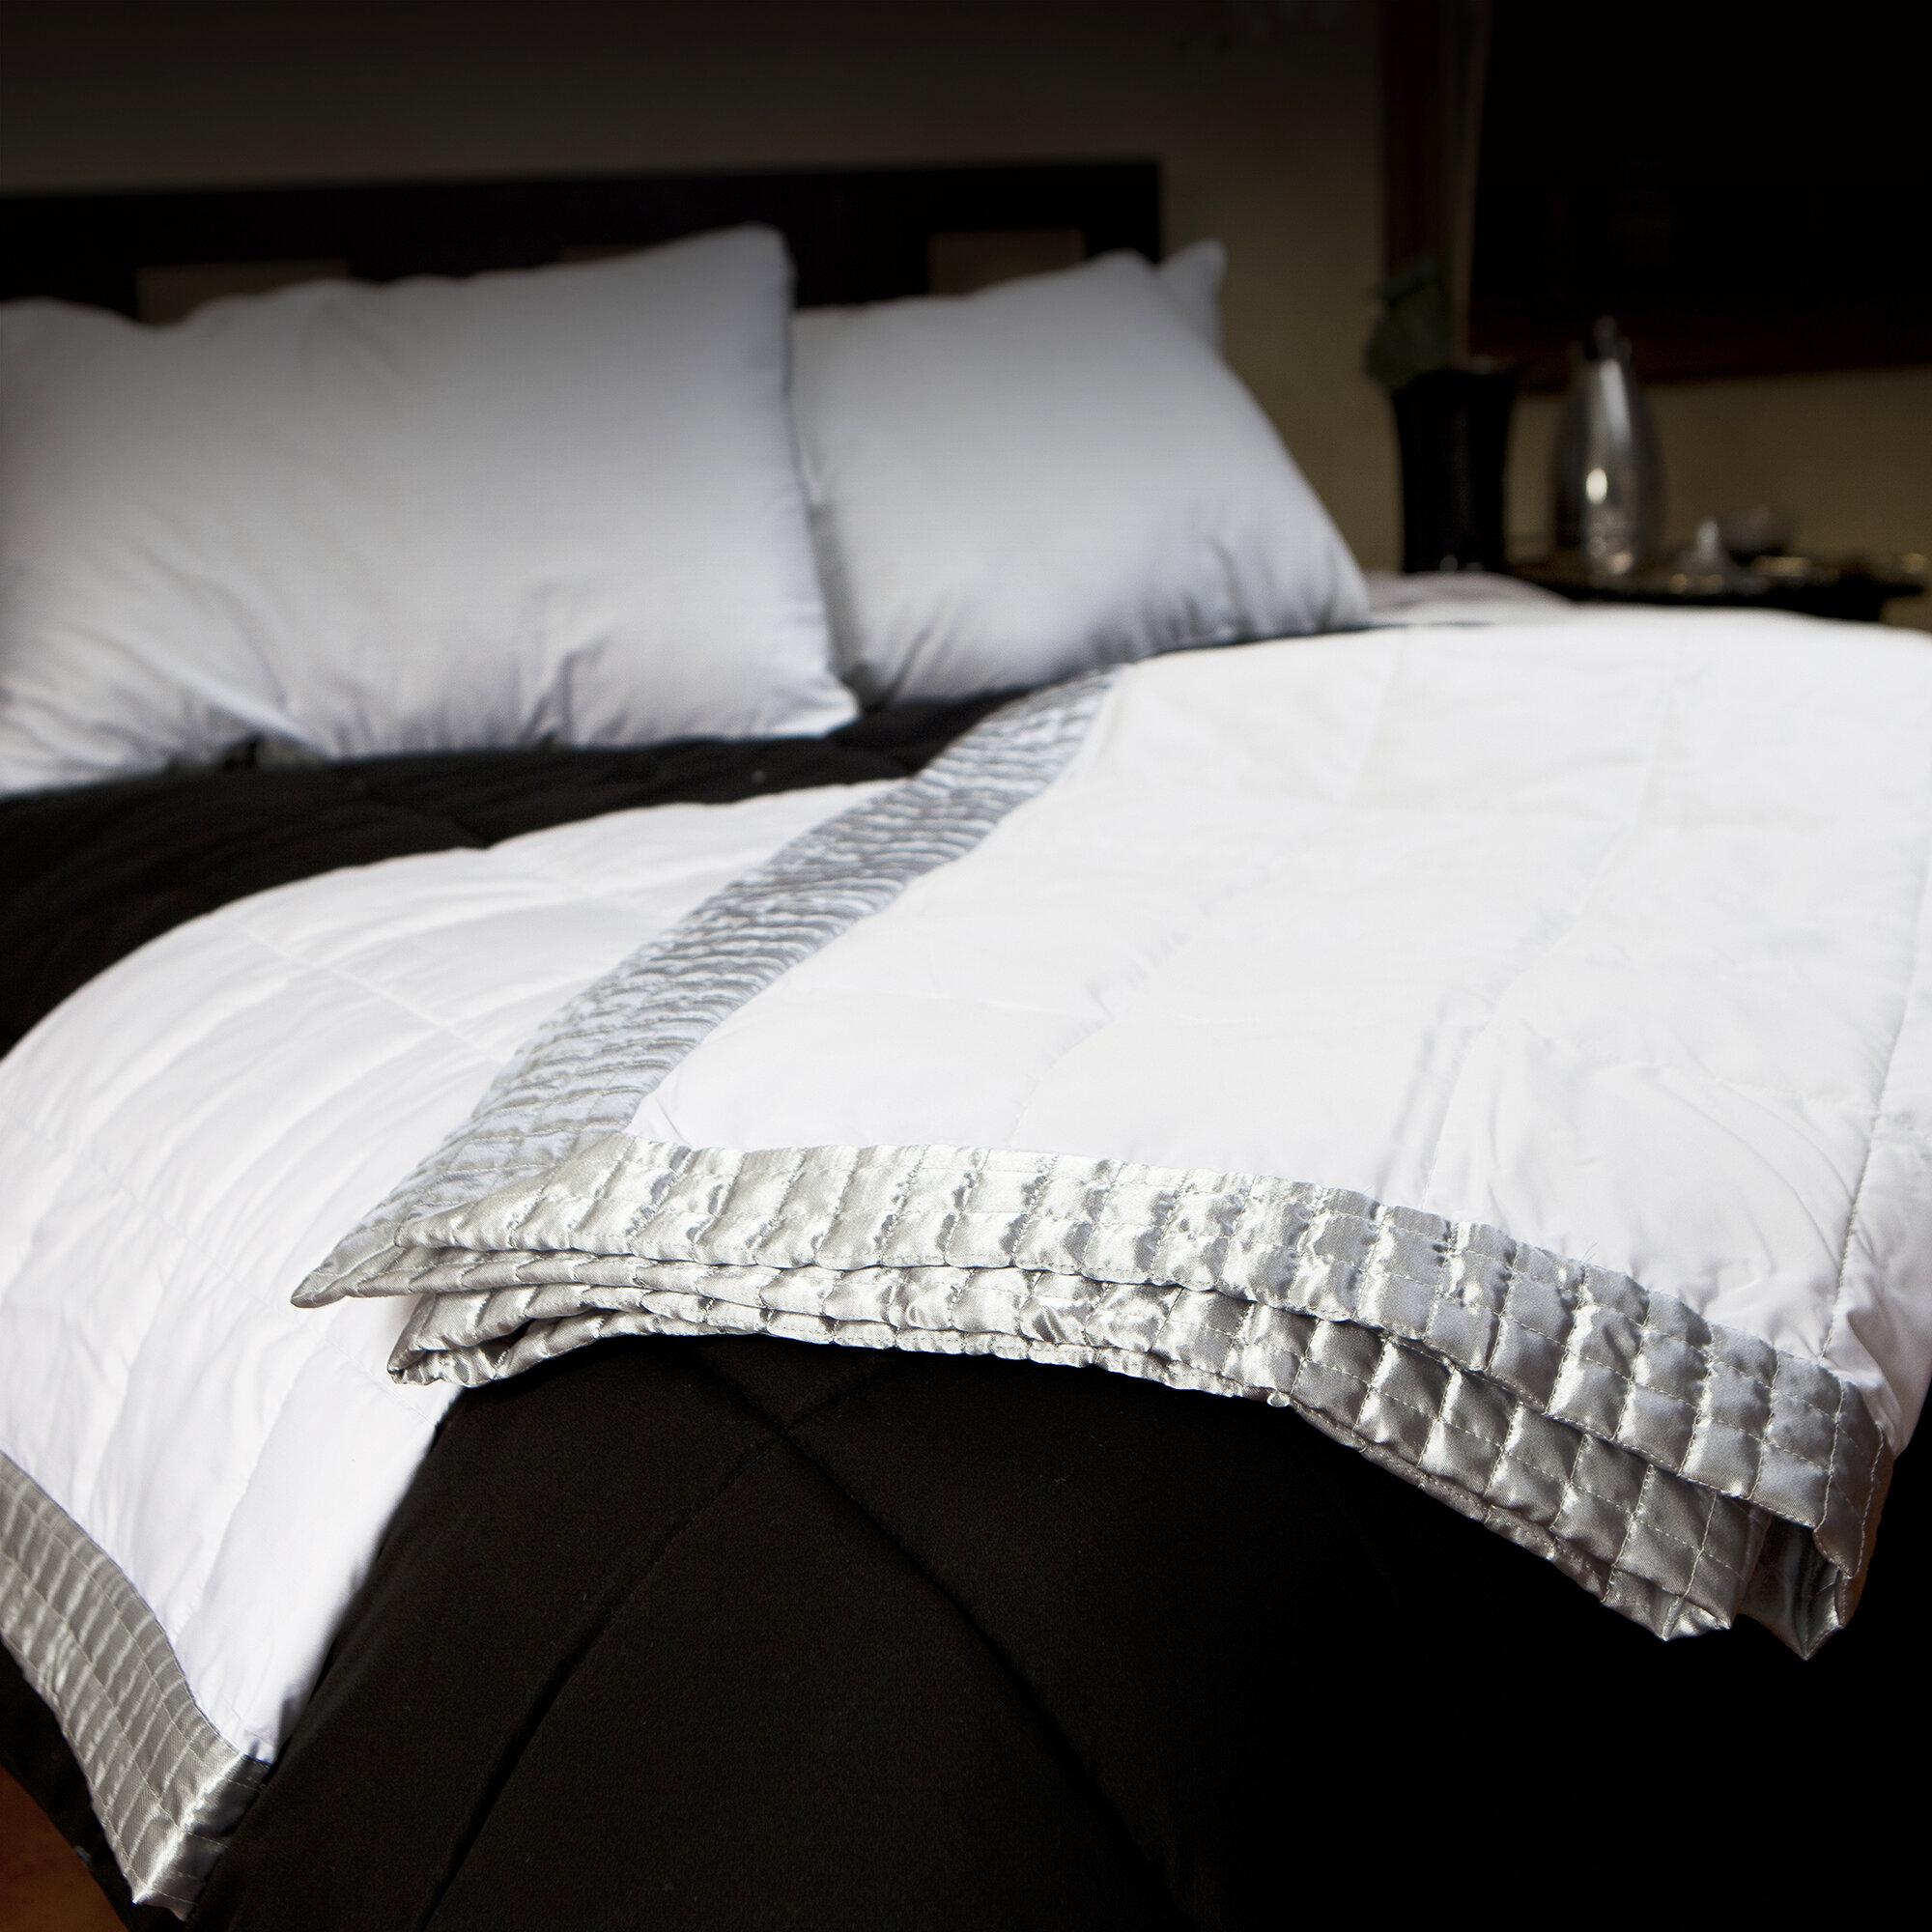 Allied home geometric shapes satin border blanket reviews wayfair jpg  2000x2000 Satin blanket 12c241da9